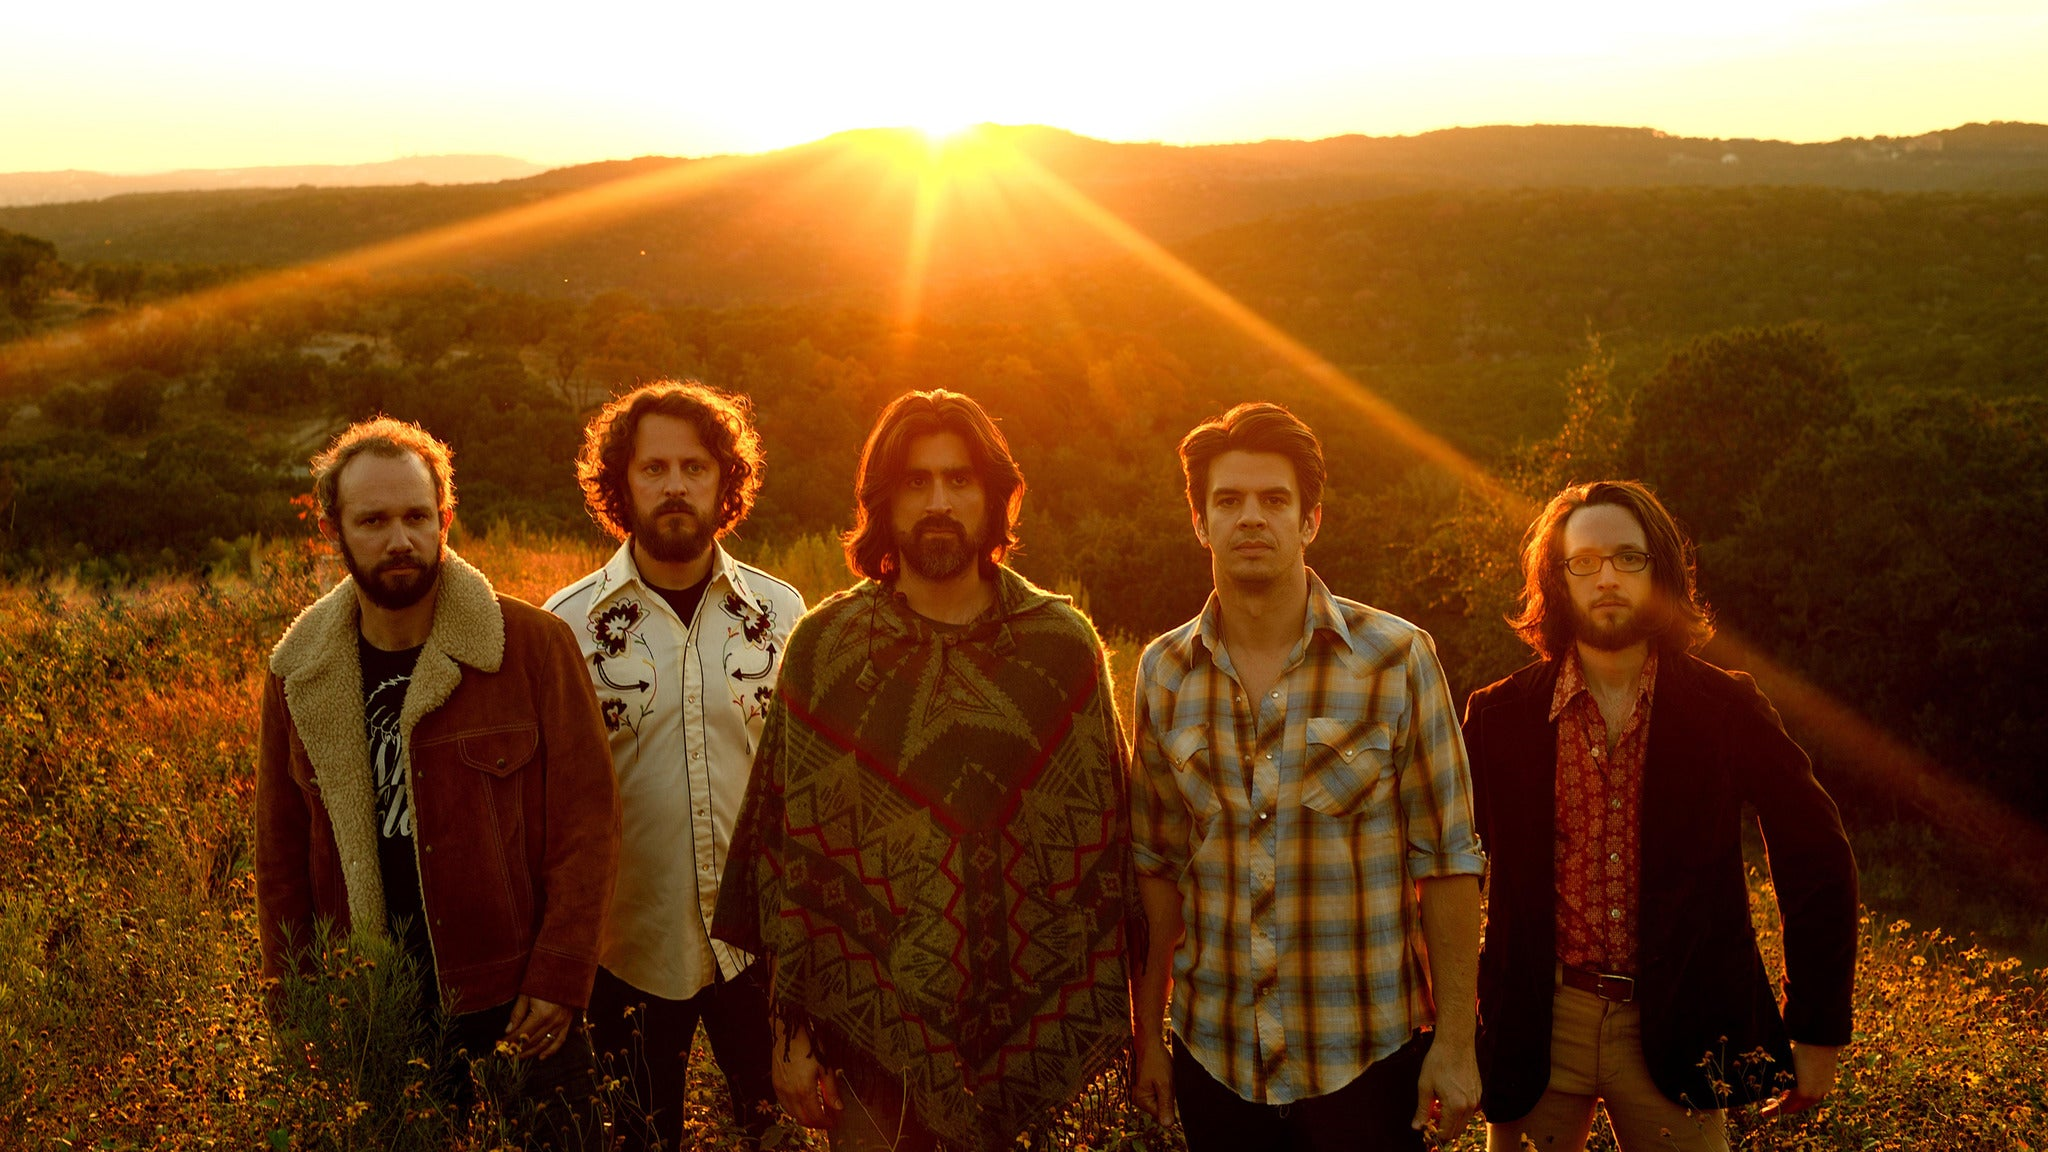 Band of Heathens at Eddie's Attic